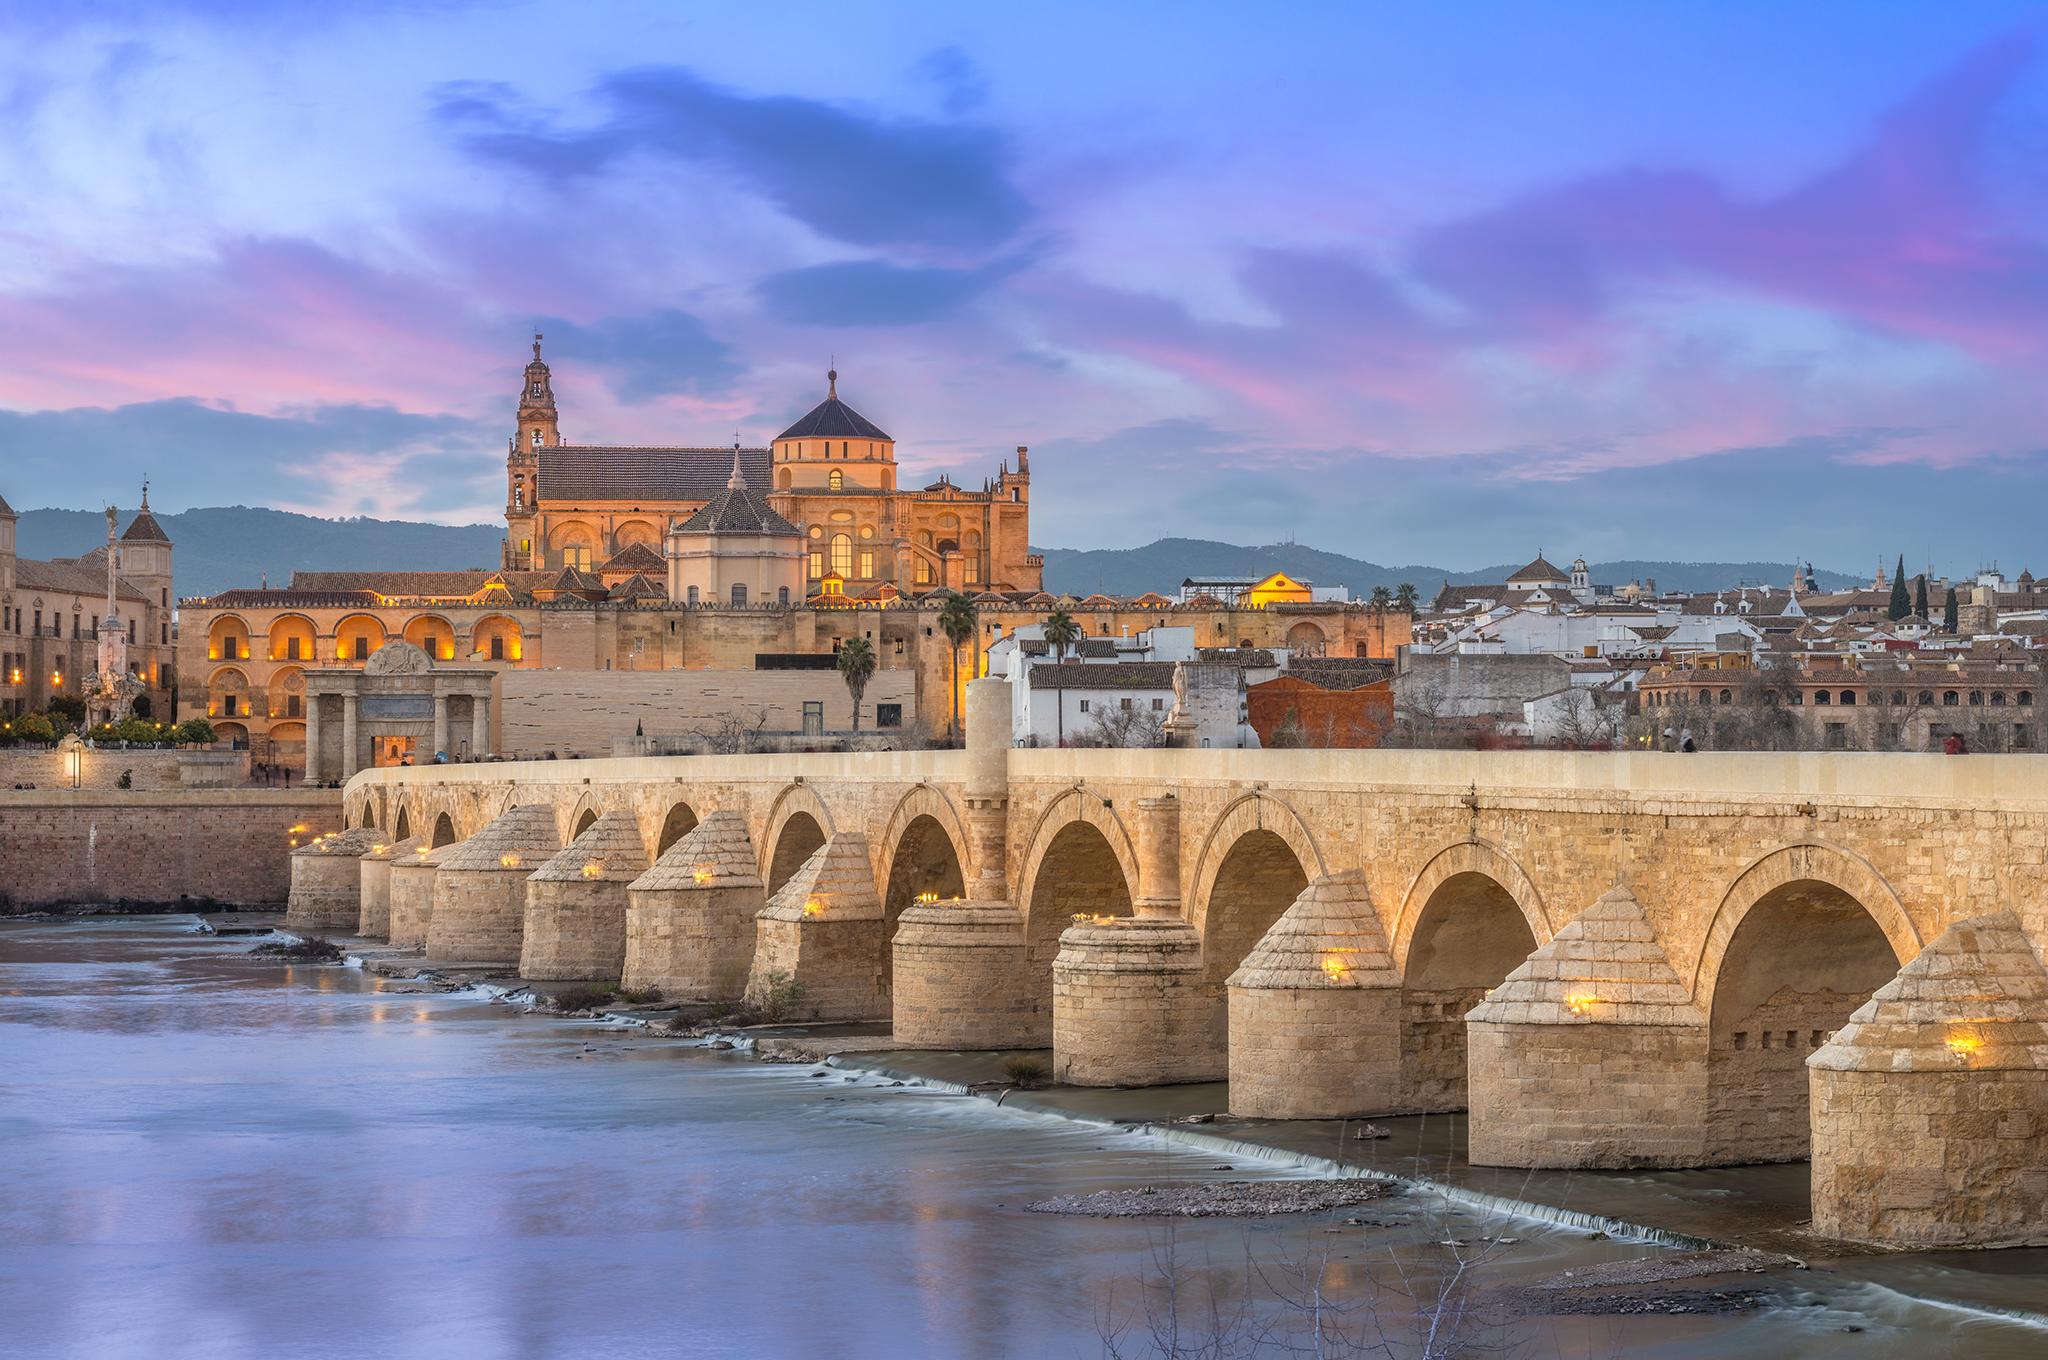 Qué ver en Córdoba - Puente Romano | Foto: La Fabrika Pixel S.l. | Dreamstime.com